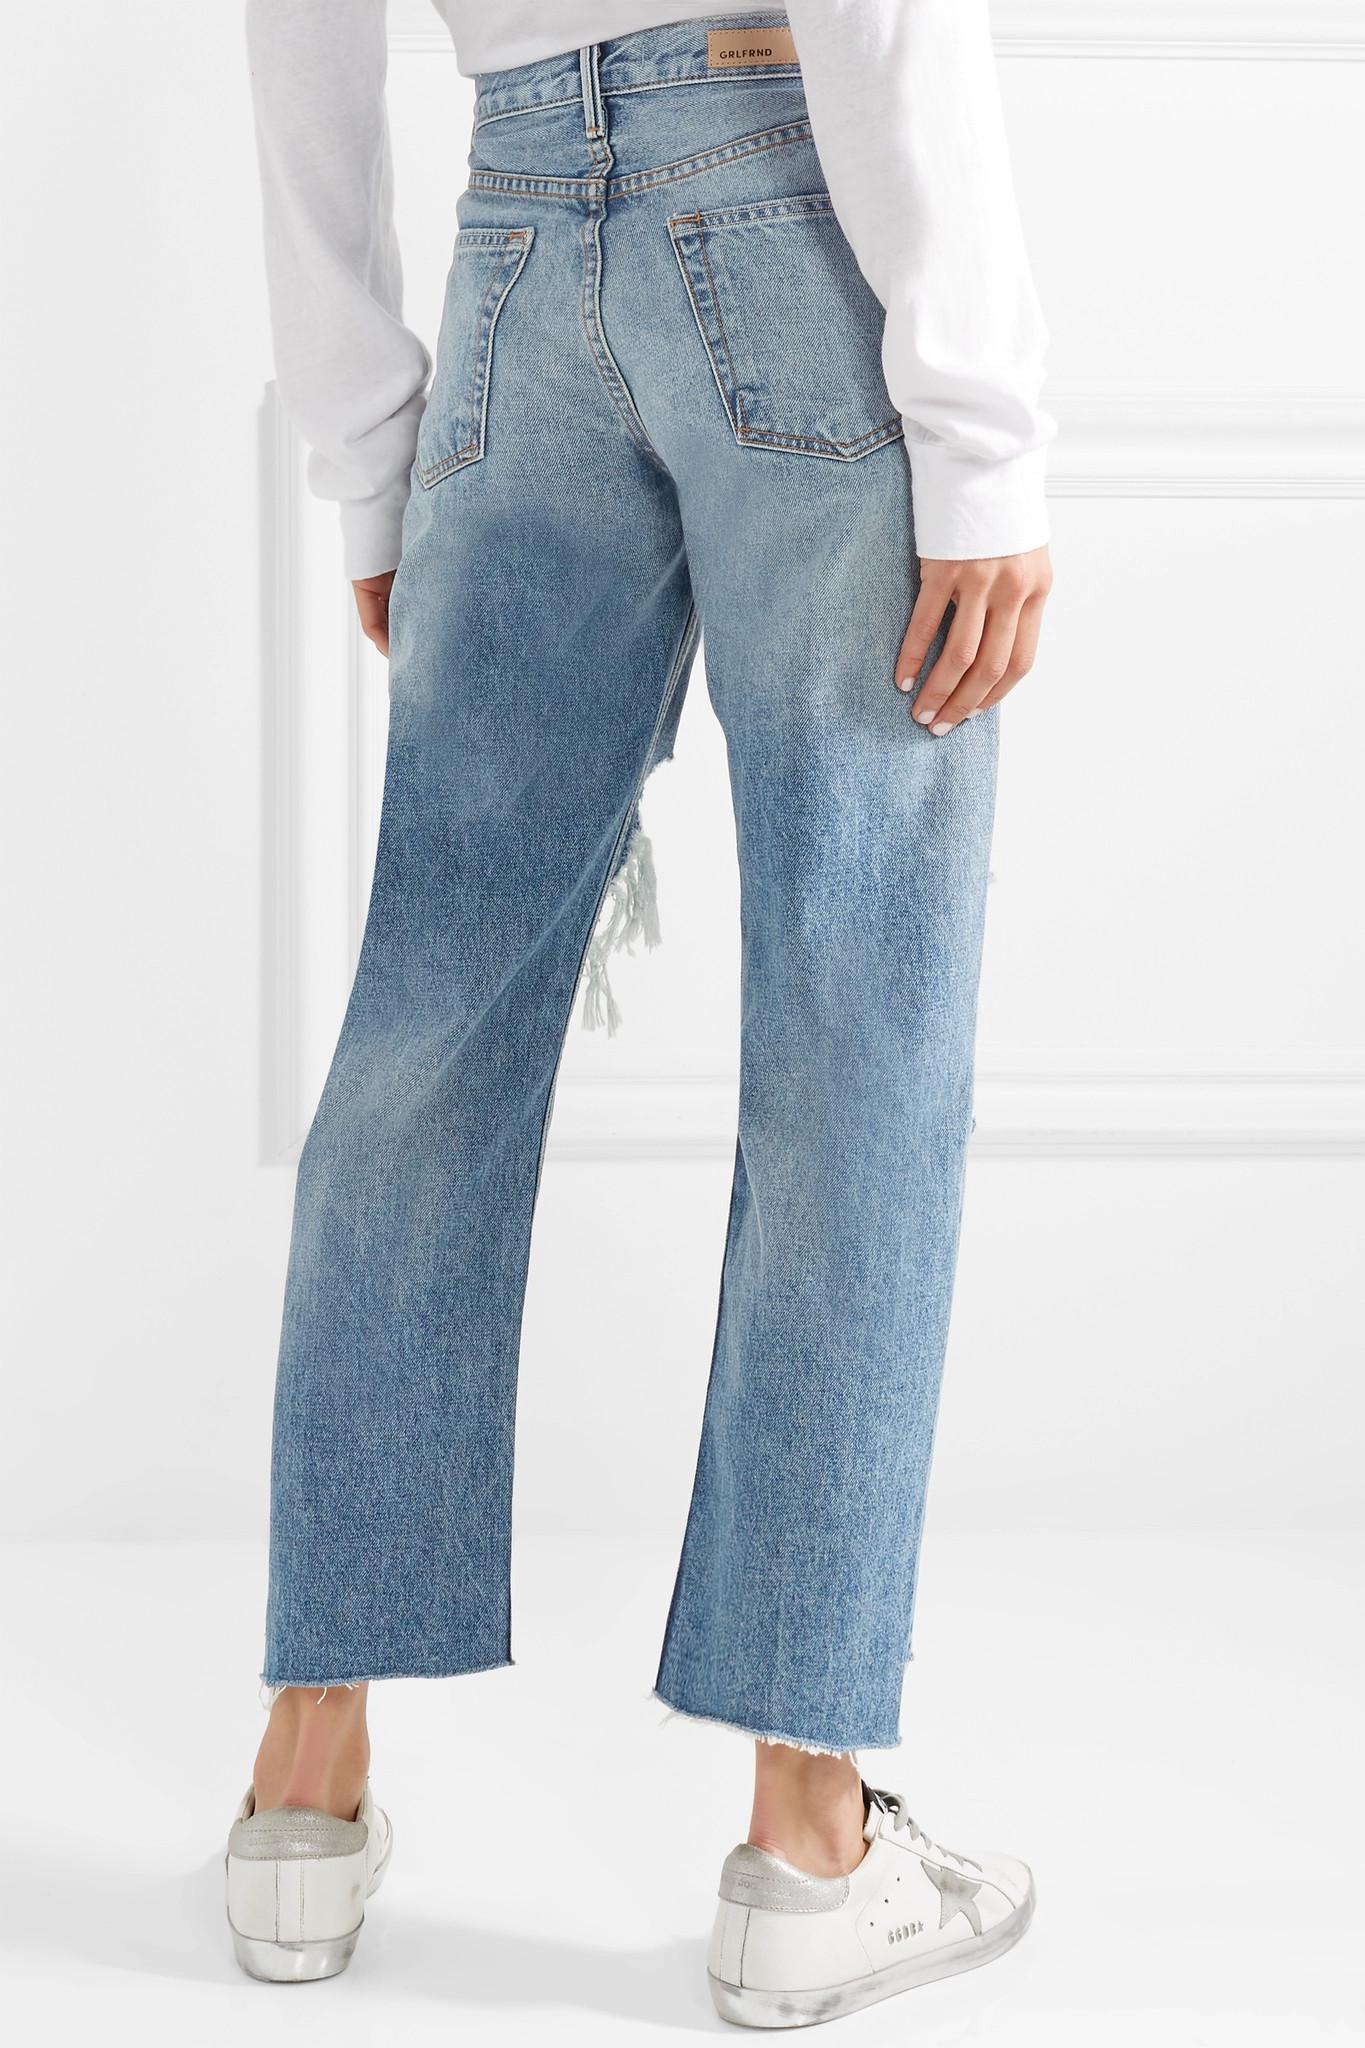 GRLFRND Denim Helena Distressed High-rise Straight-leg Jeans in Mid Denim (Blue)